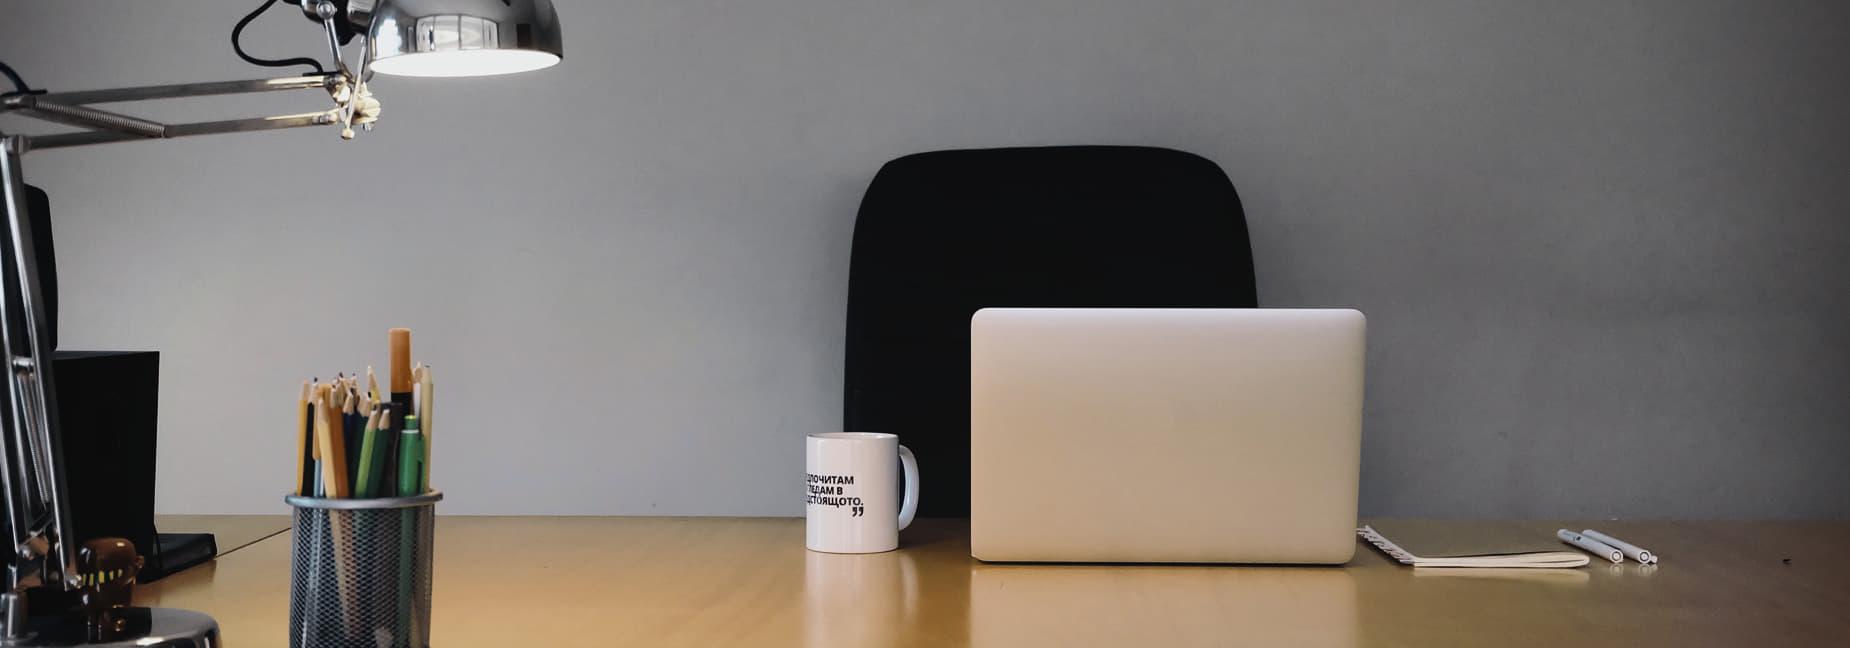 Employee Background Checks Are Being Delayed Due To Coronavirus